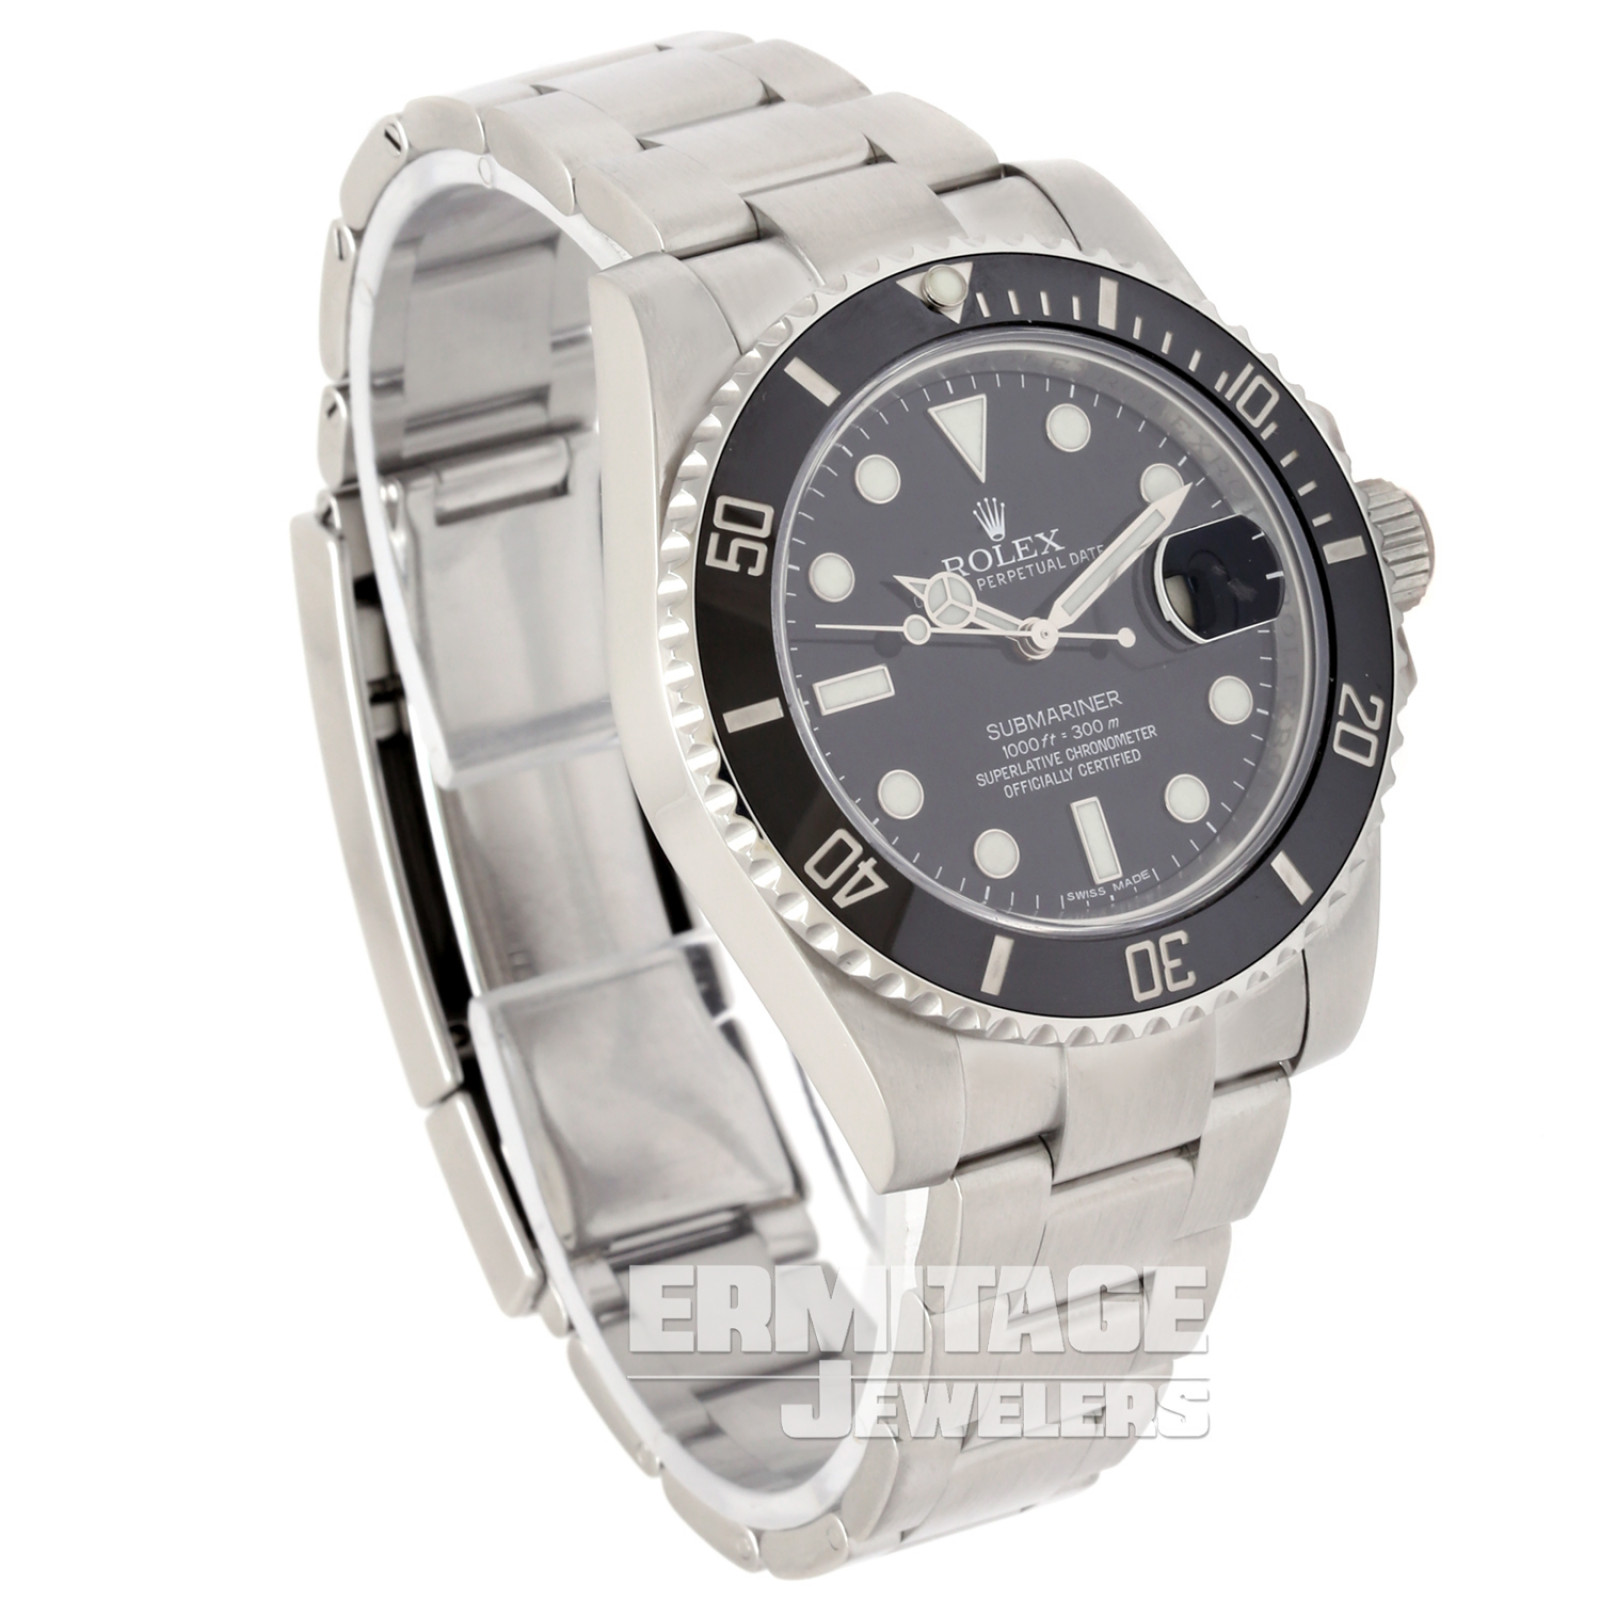 Rolex Submariner 116610 Mint Condition